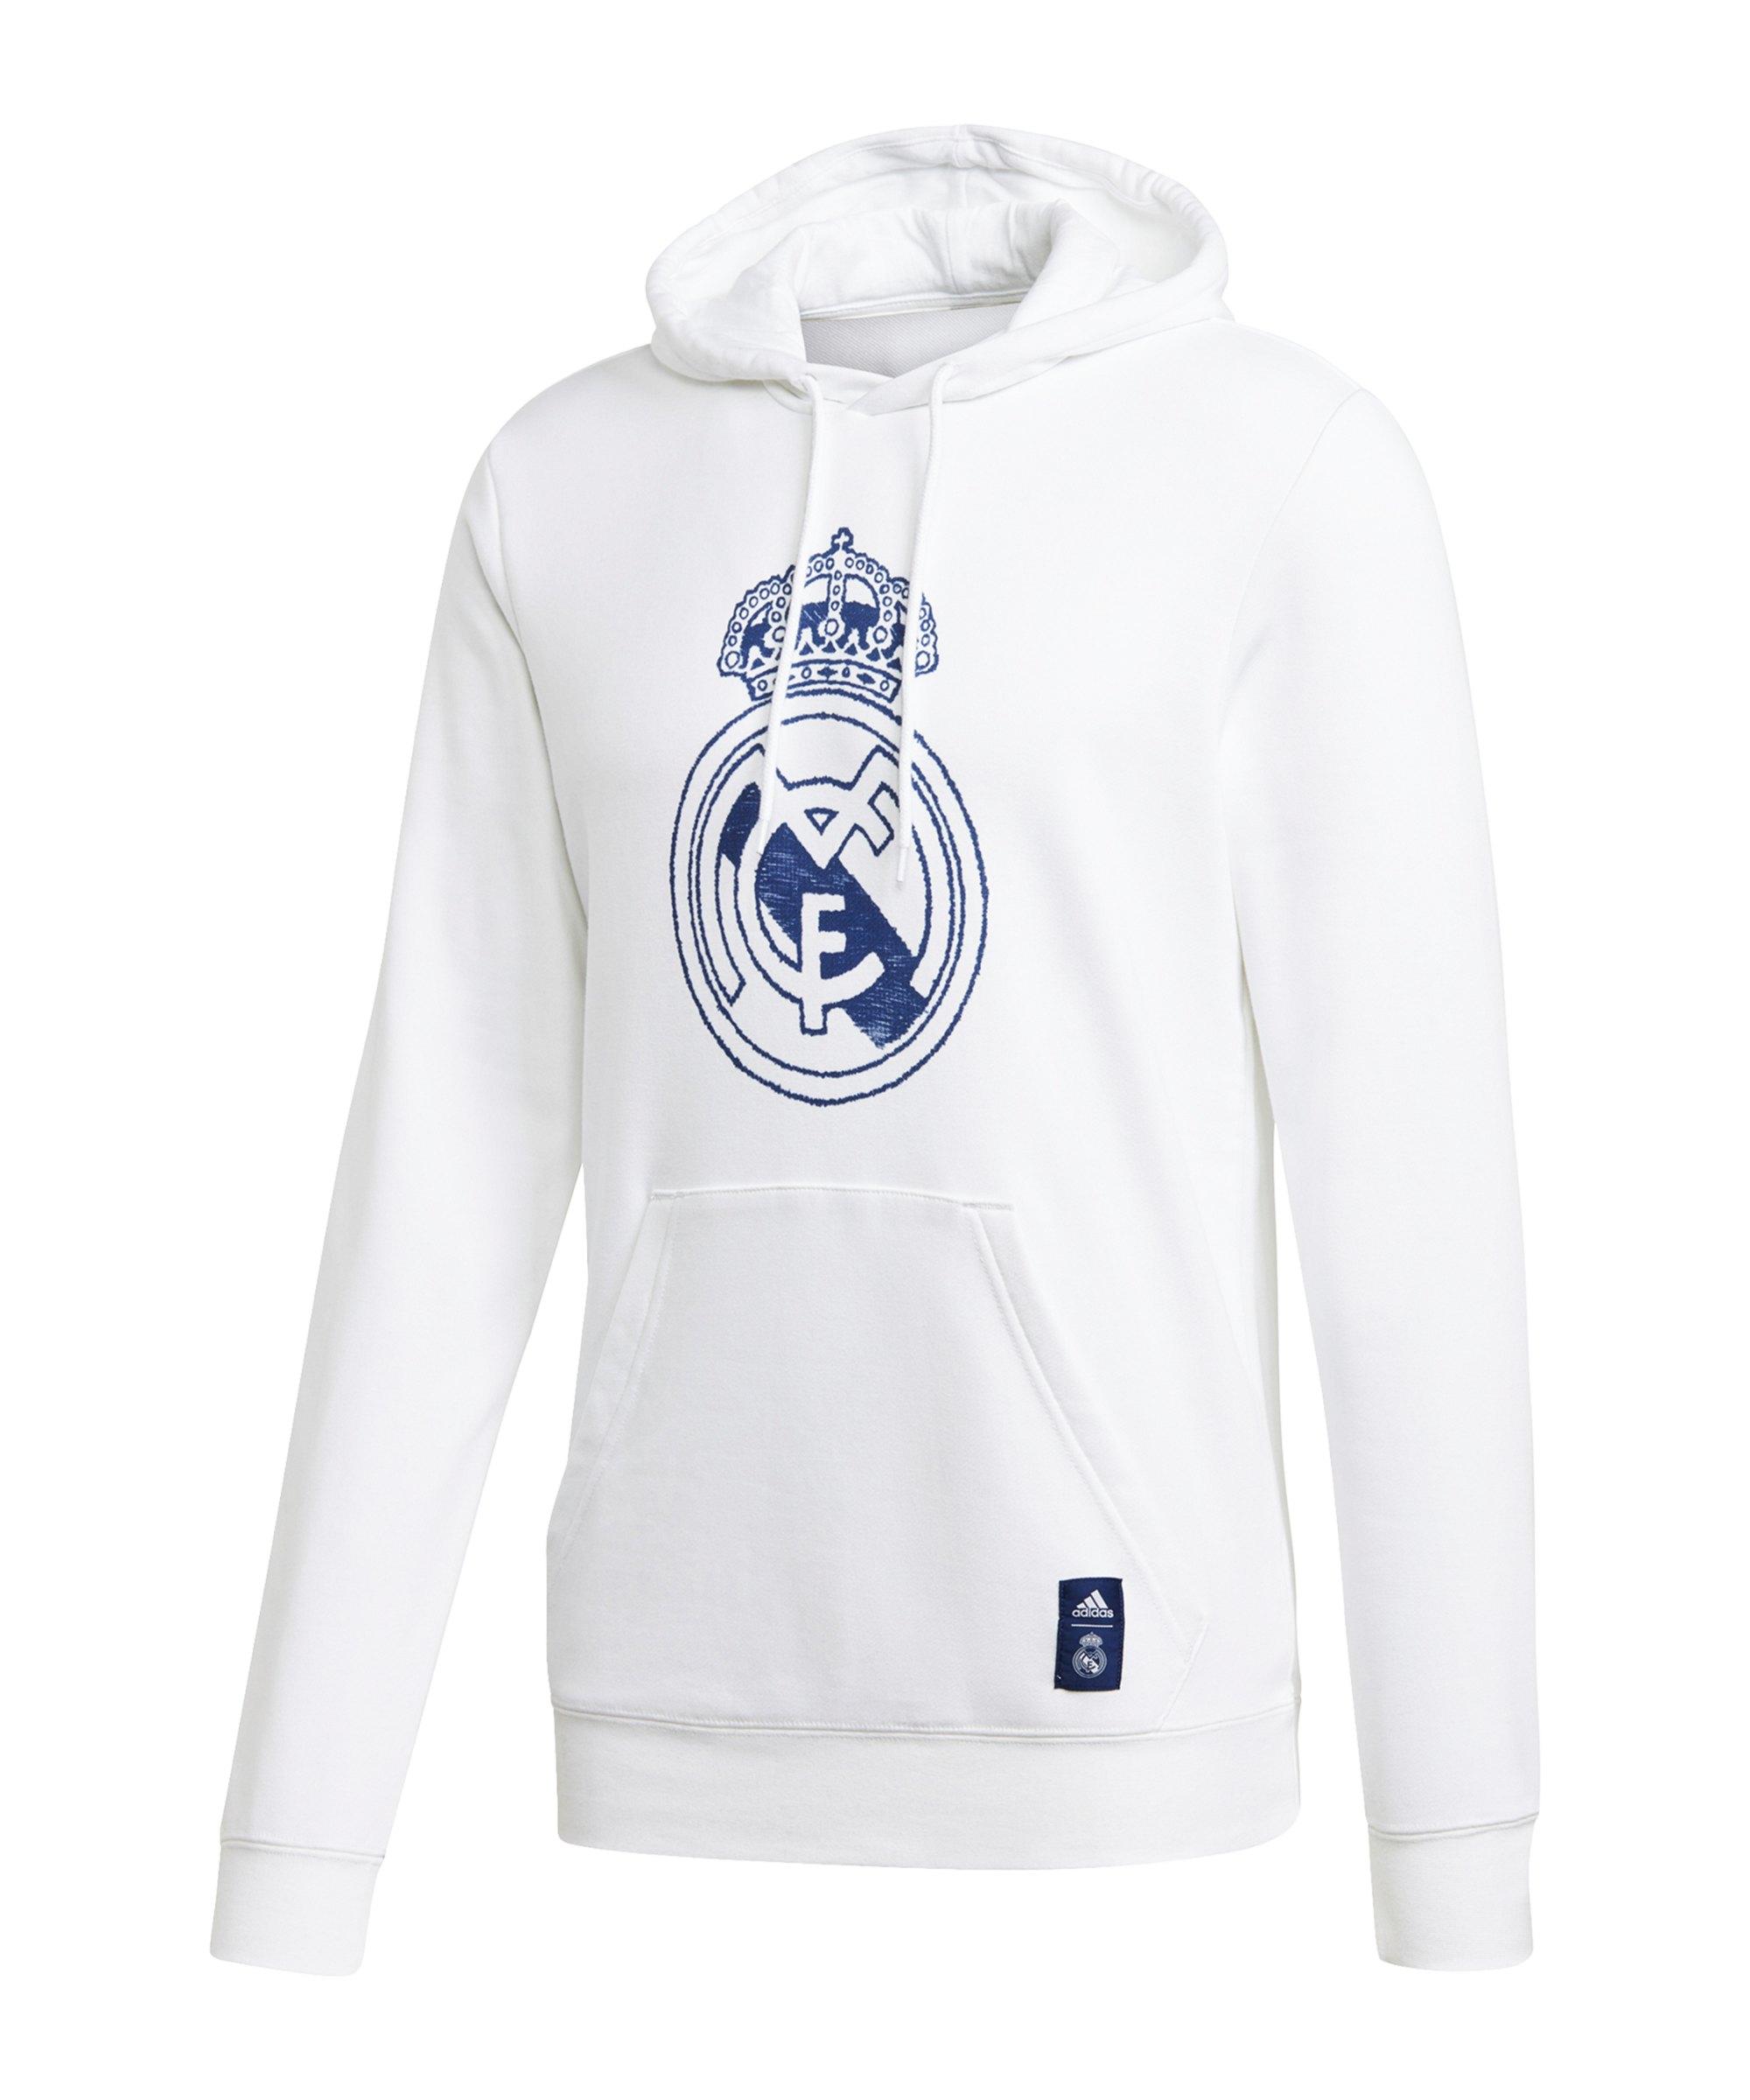 adidas Real Madrid DNA Hoody Weiss Blau - weiss